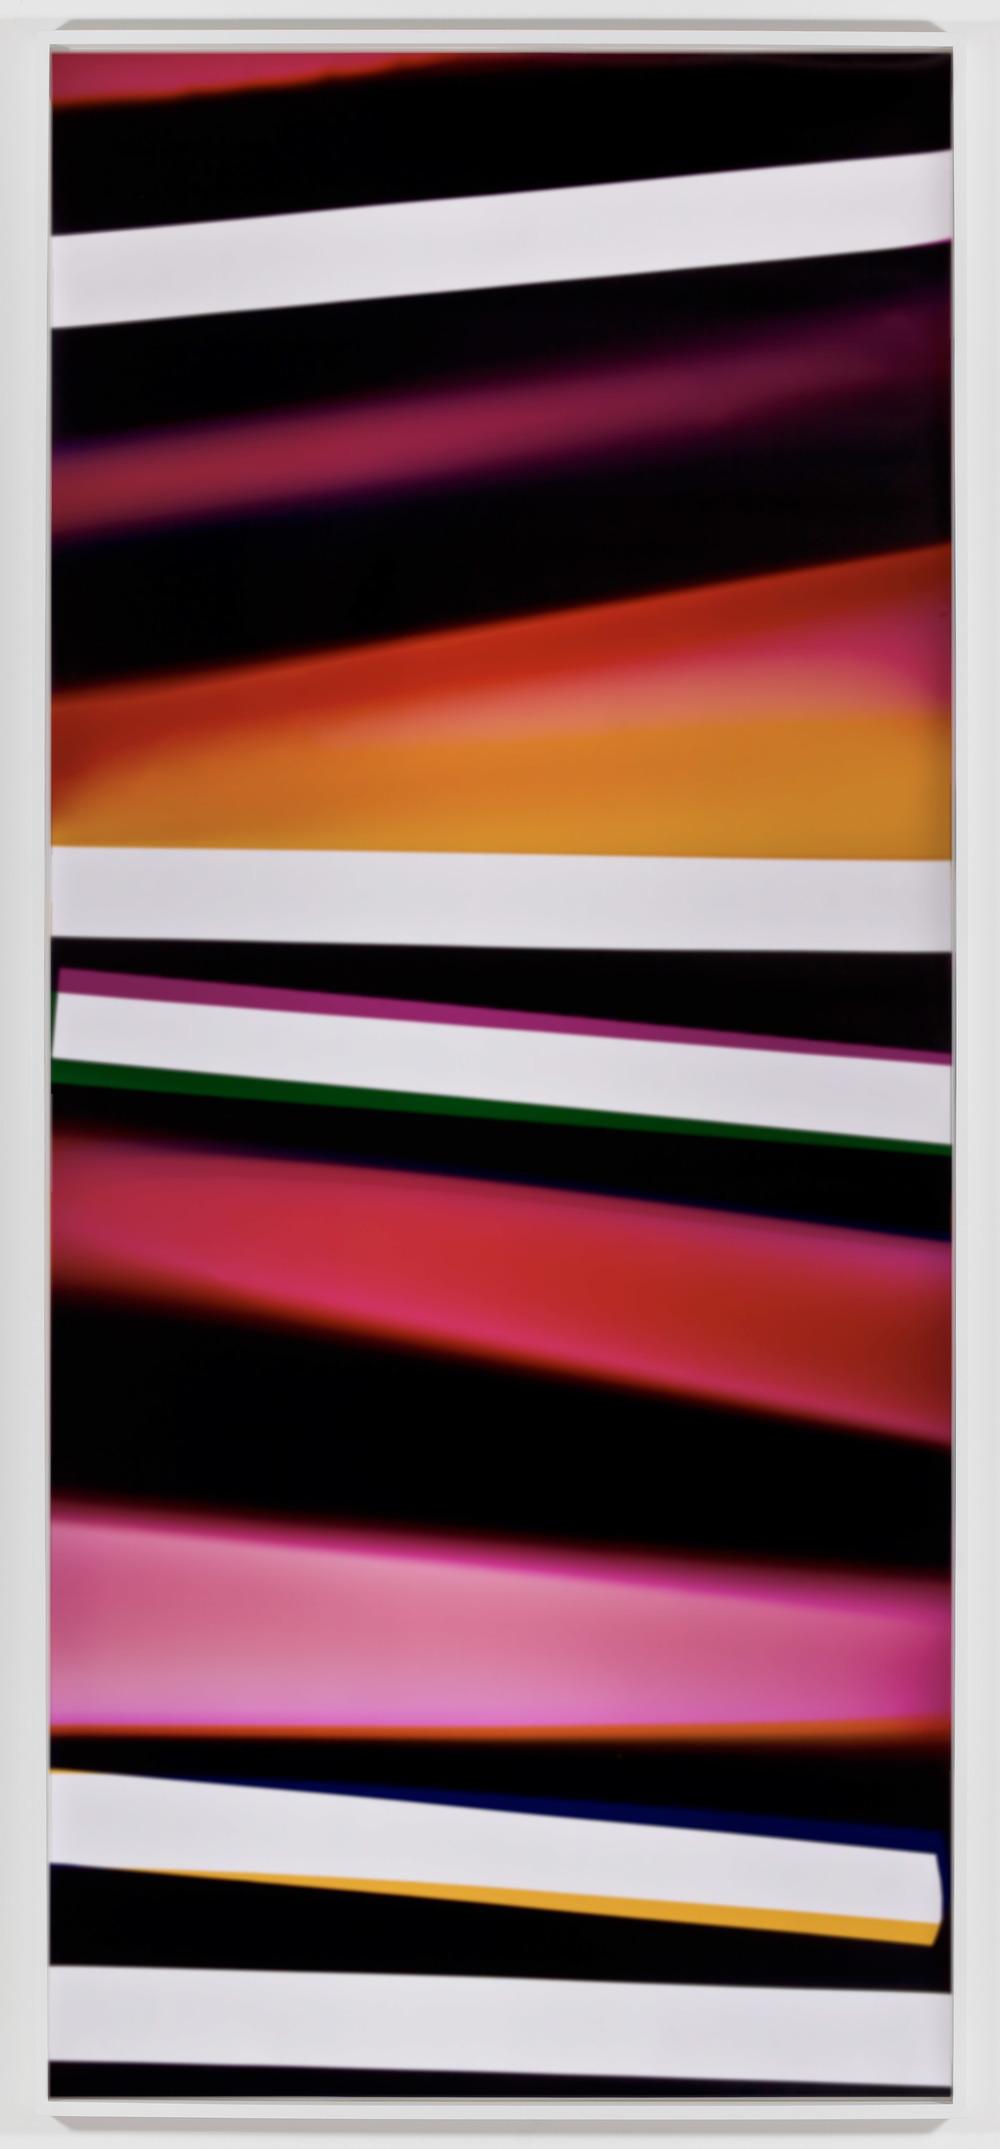 Black Curl (CMY/Five Magnet: Irvine, California, March 26,2010, Fujicolor Crystal Archive Super Type C, Em. No. 165-021, 07510)    2011   Color photographic paper  112 x 50 inches   Black Curls, 2010–2013